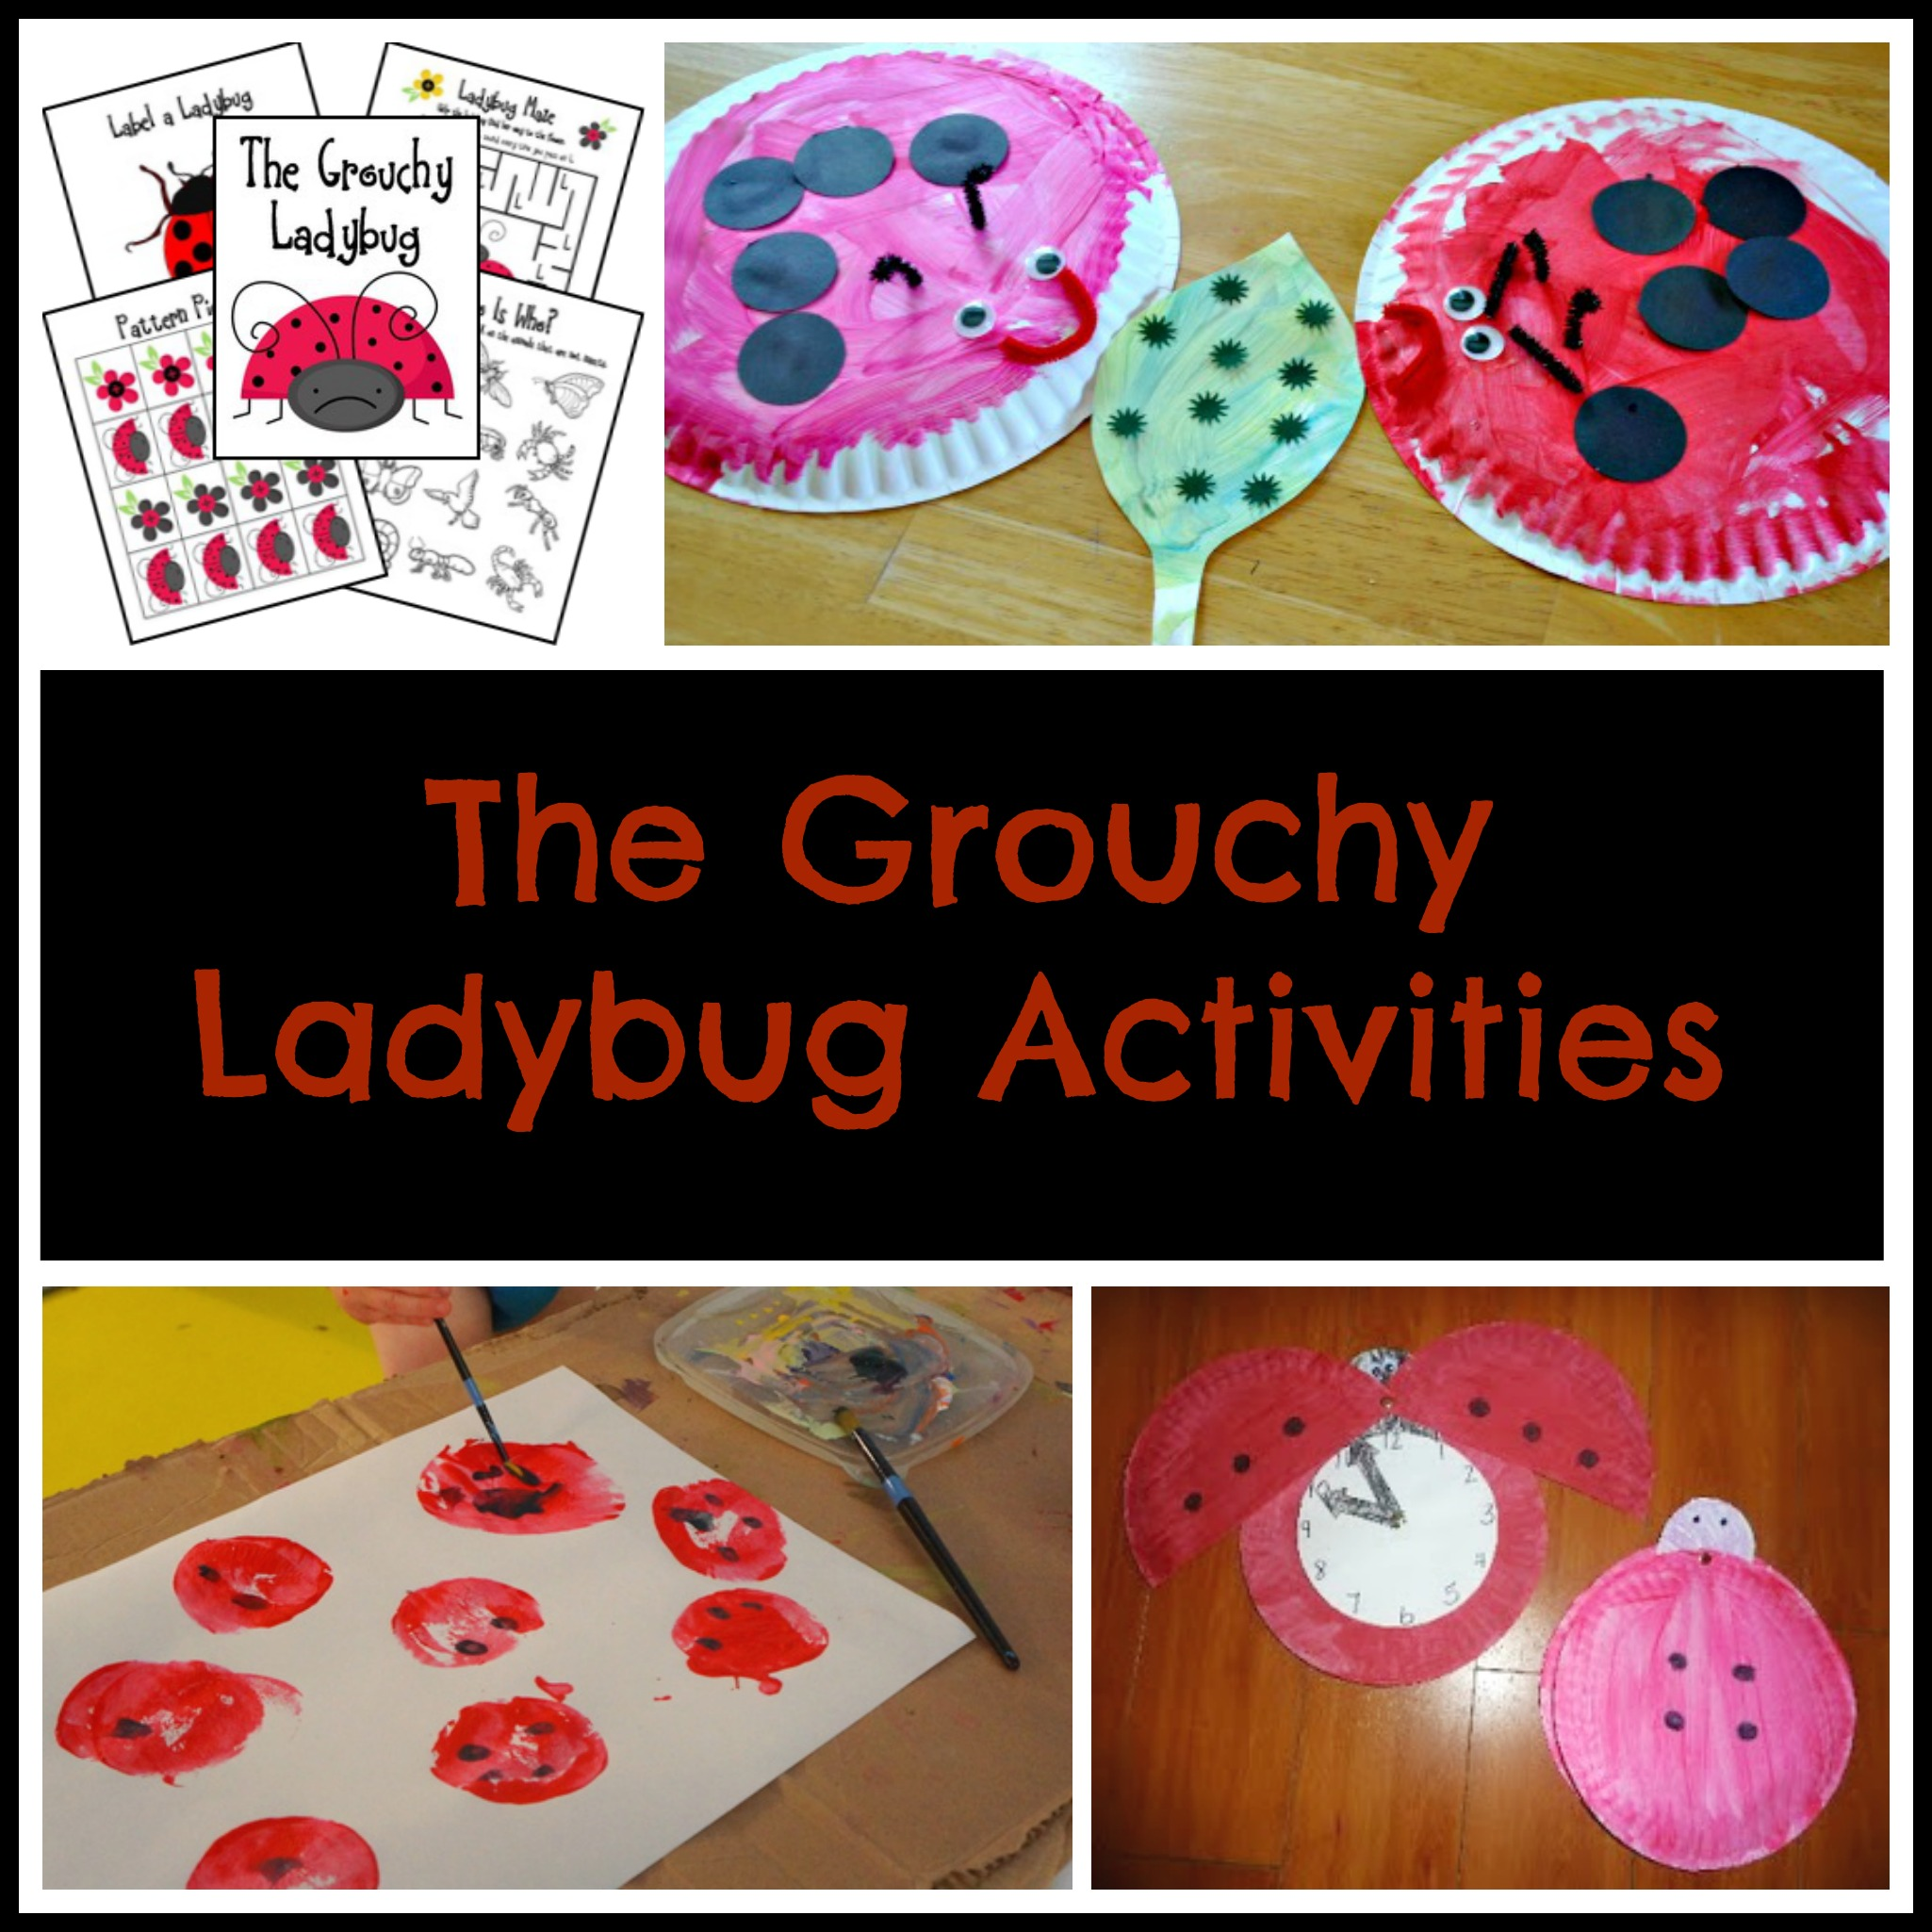 The Grouchy Ladybug Activities